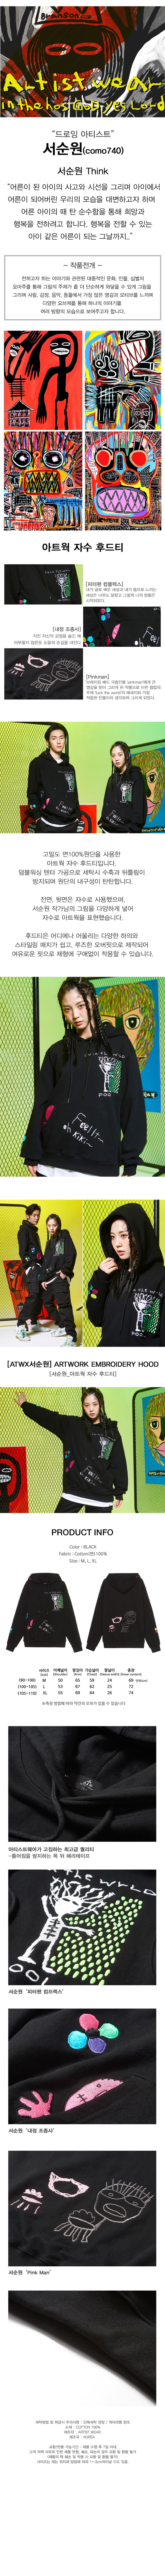 COMO740-ARTWORK-Hood_01.jpg